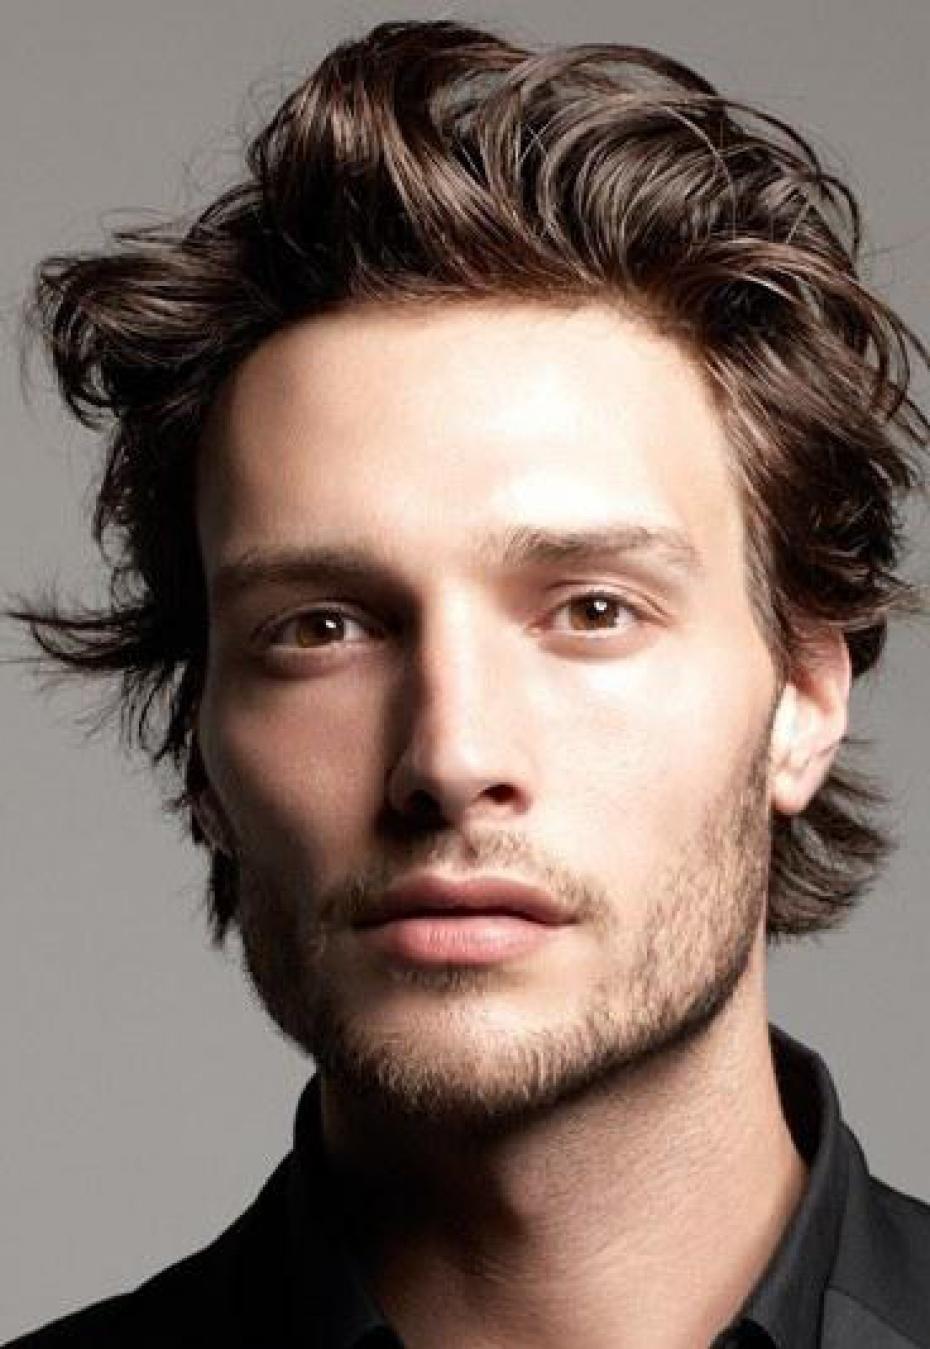 frisuren männer Schöne Sachen Frisuren männer